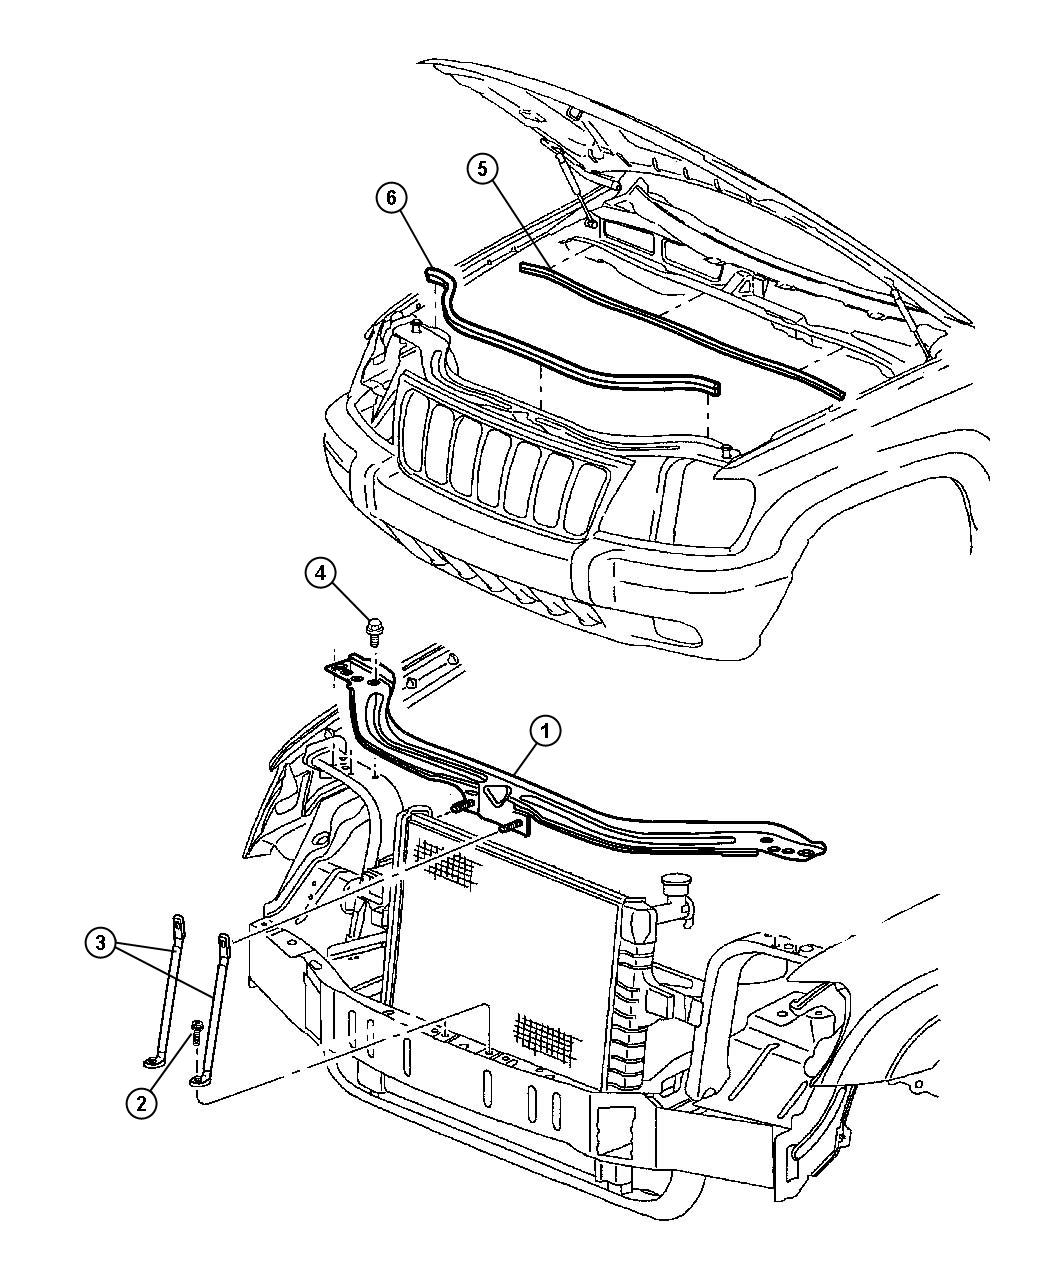 Jeep Wrangler Unlimited X 3 8l V6 A T 4x4 Screw